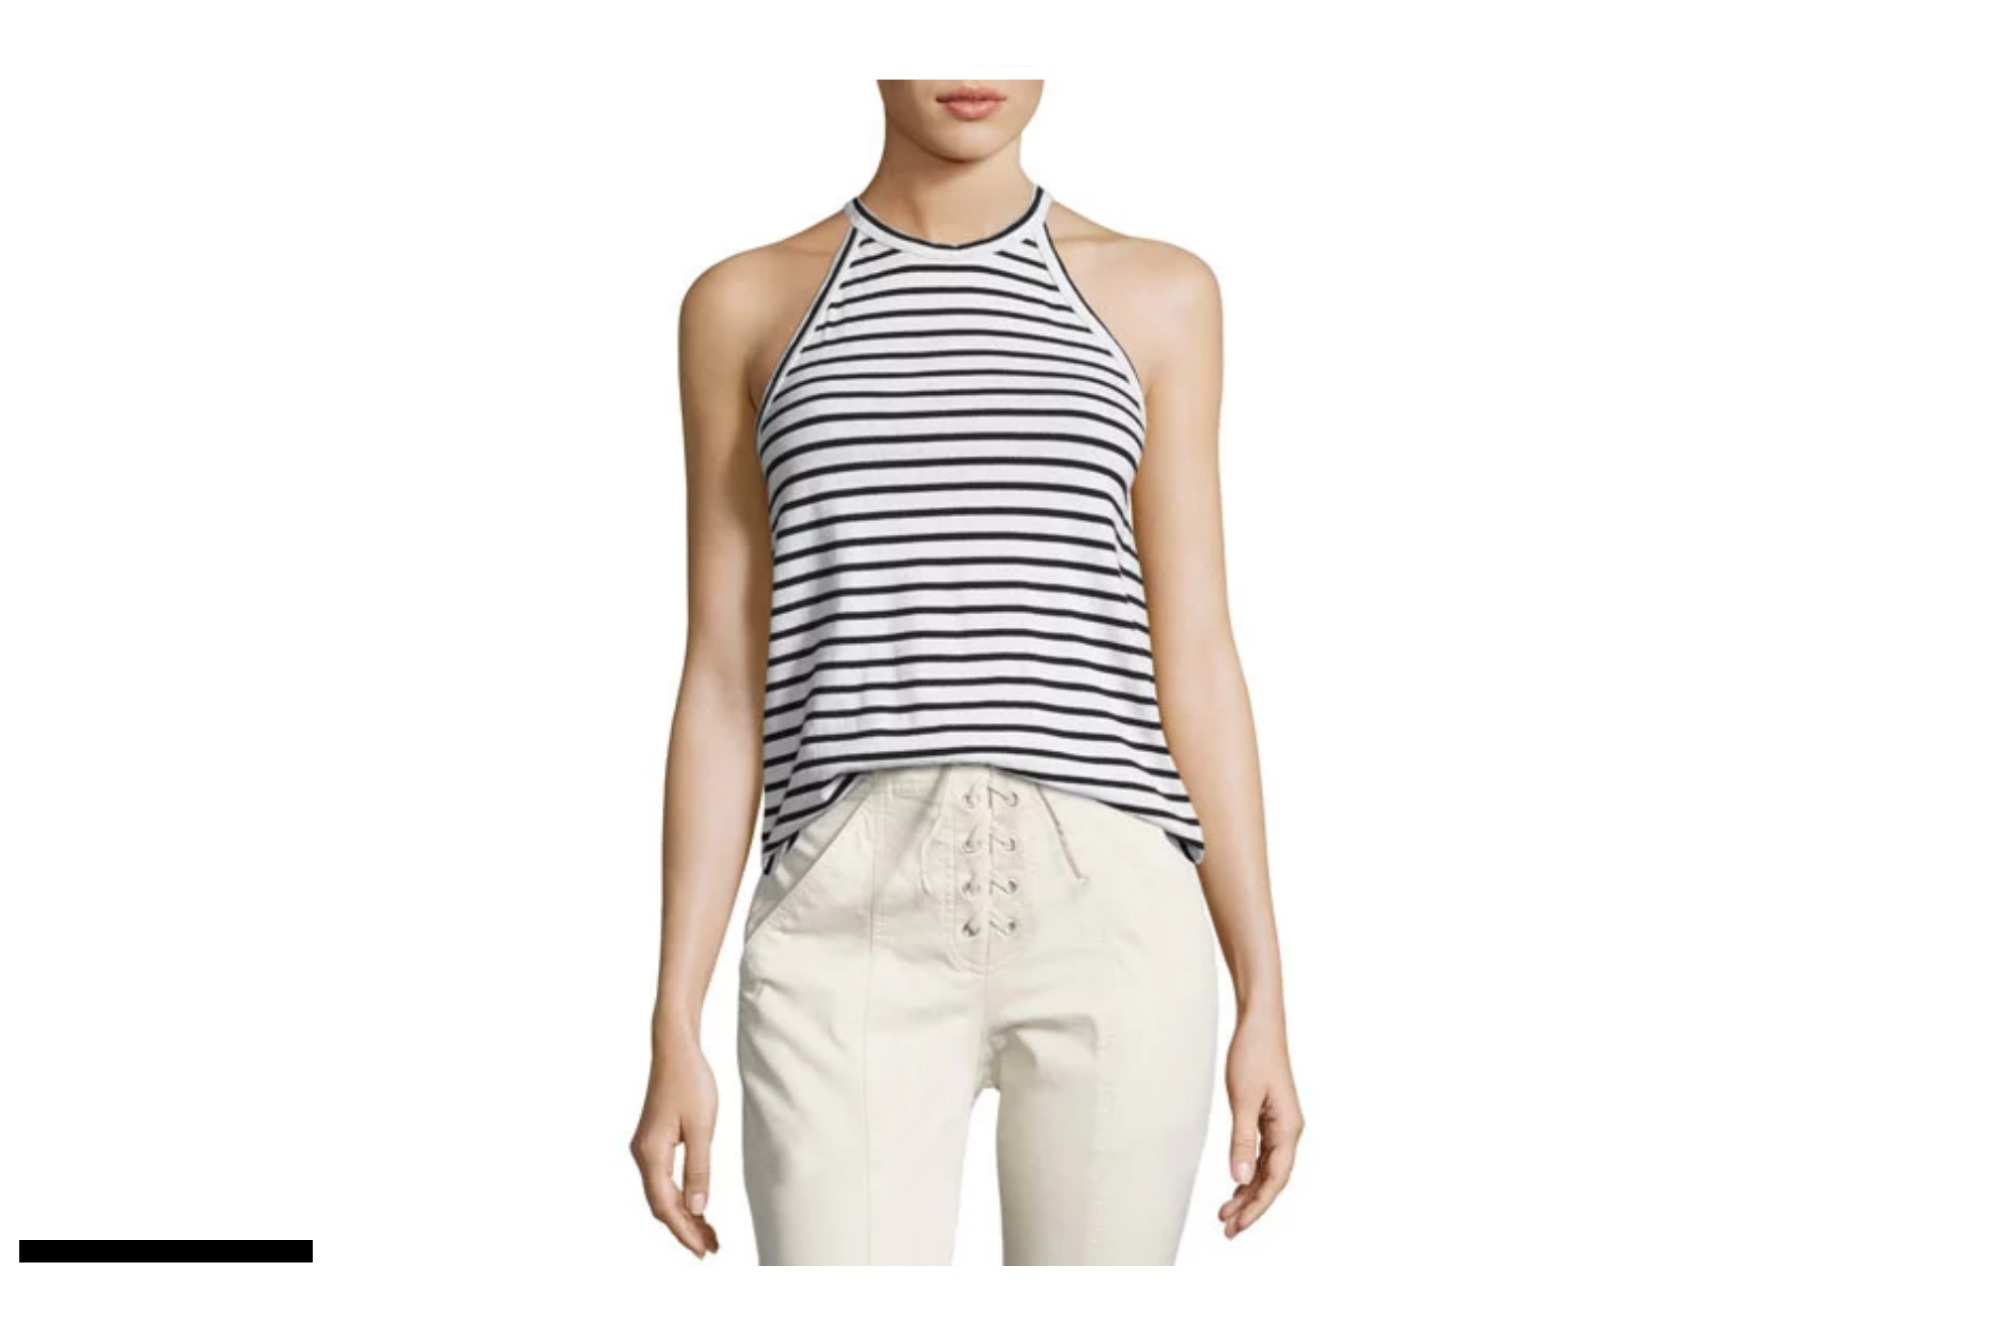 A Striped T-Shirt